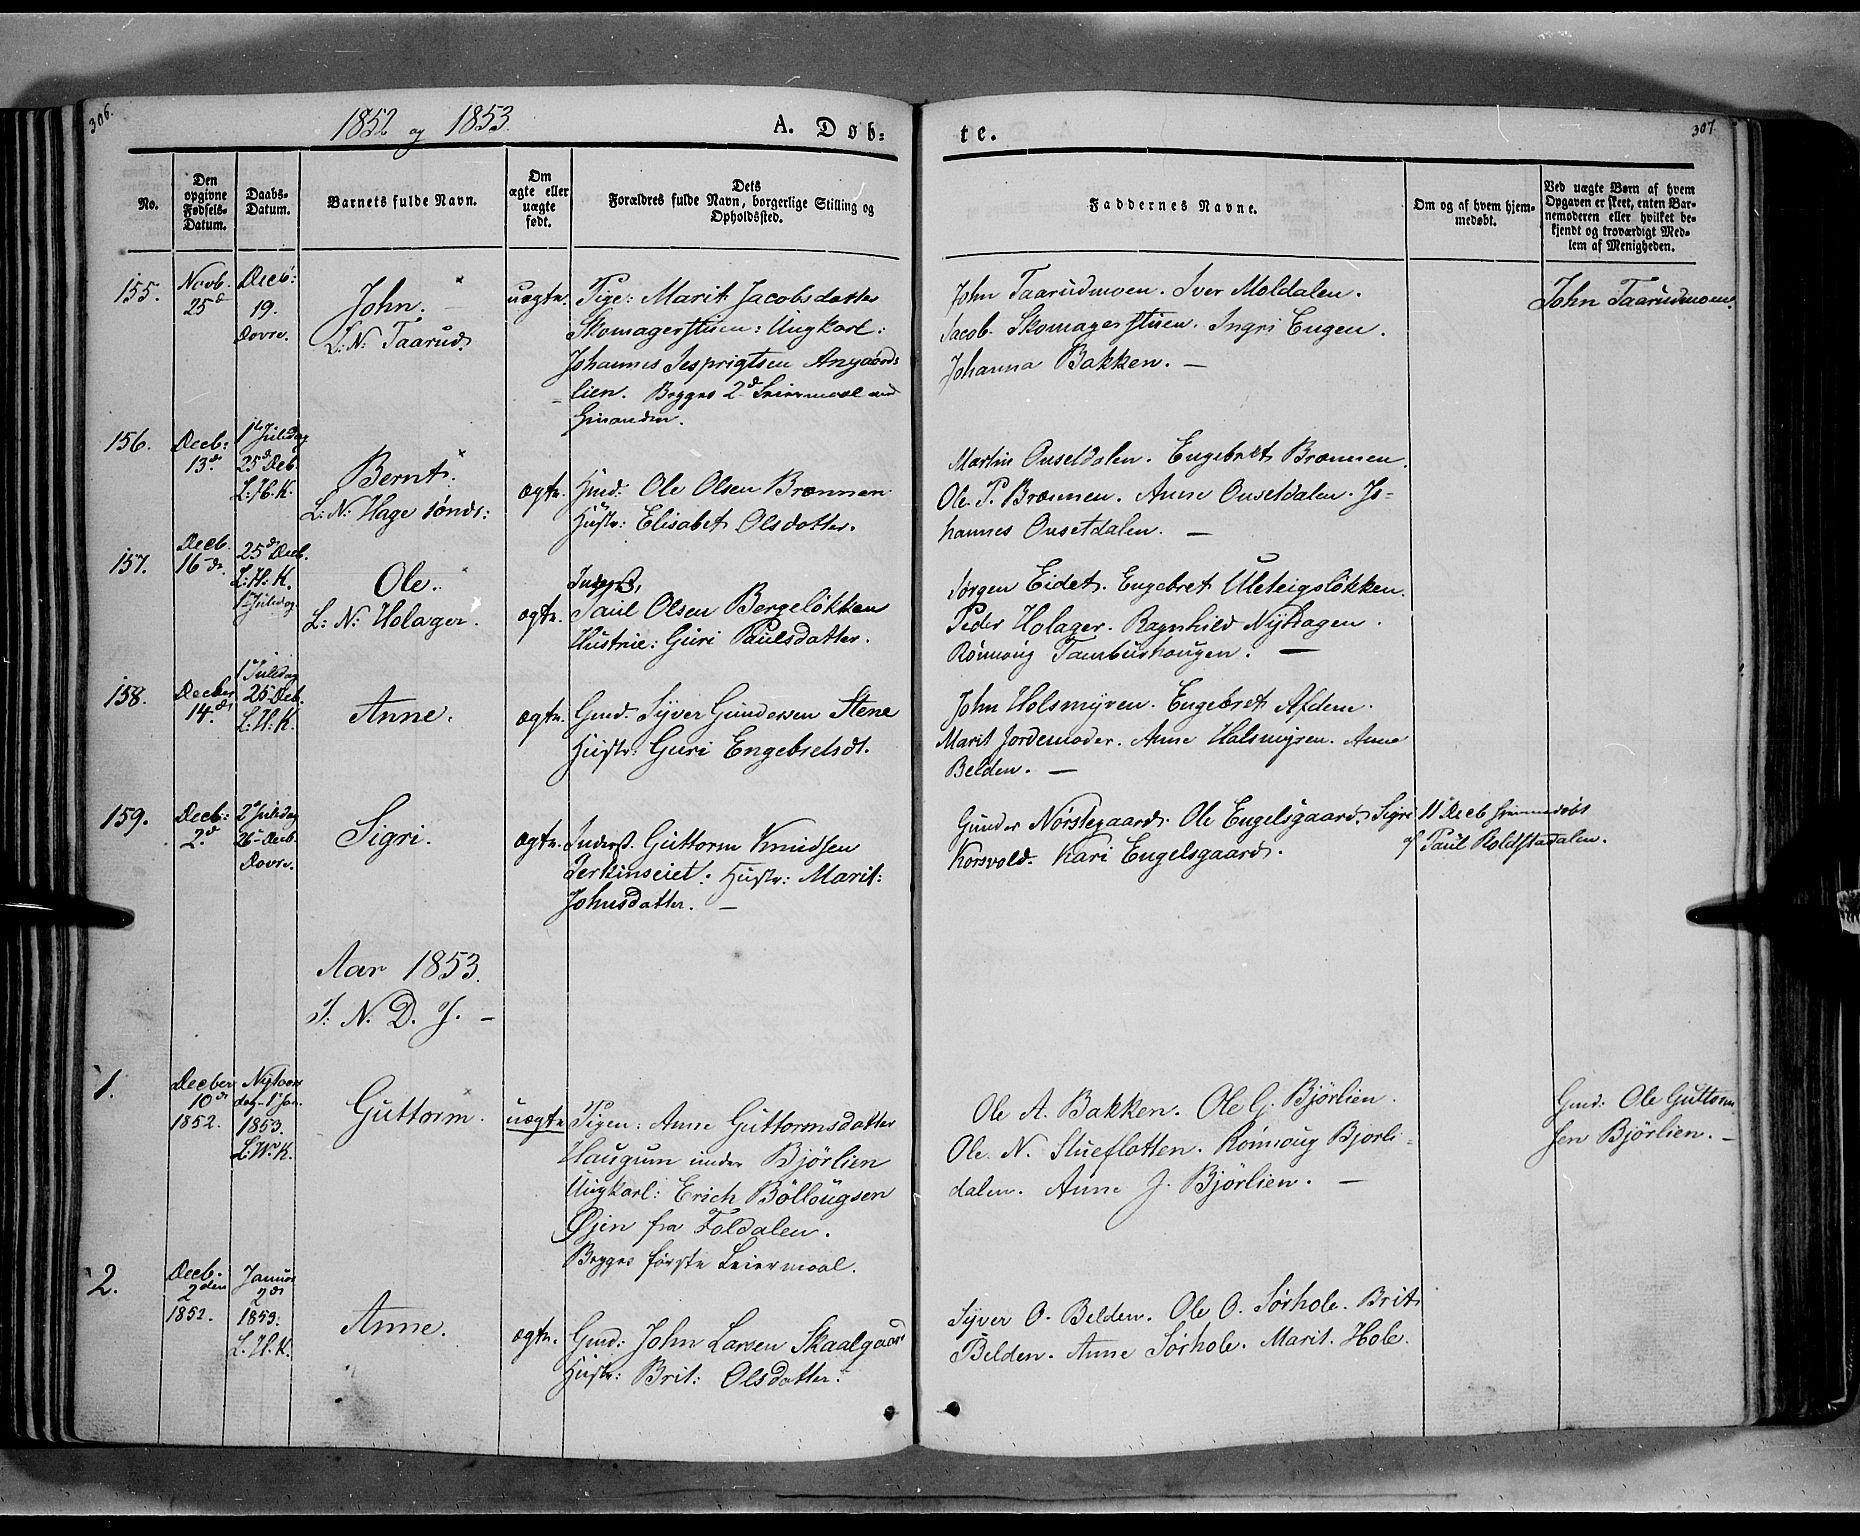 SAH, Lesja prestekontor, Ministerialbok nr. 6A, 1843-1854, s. 306-307